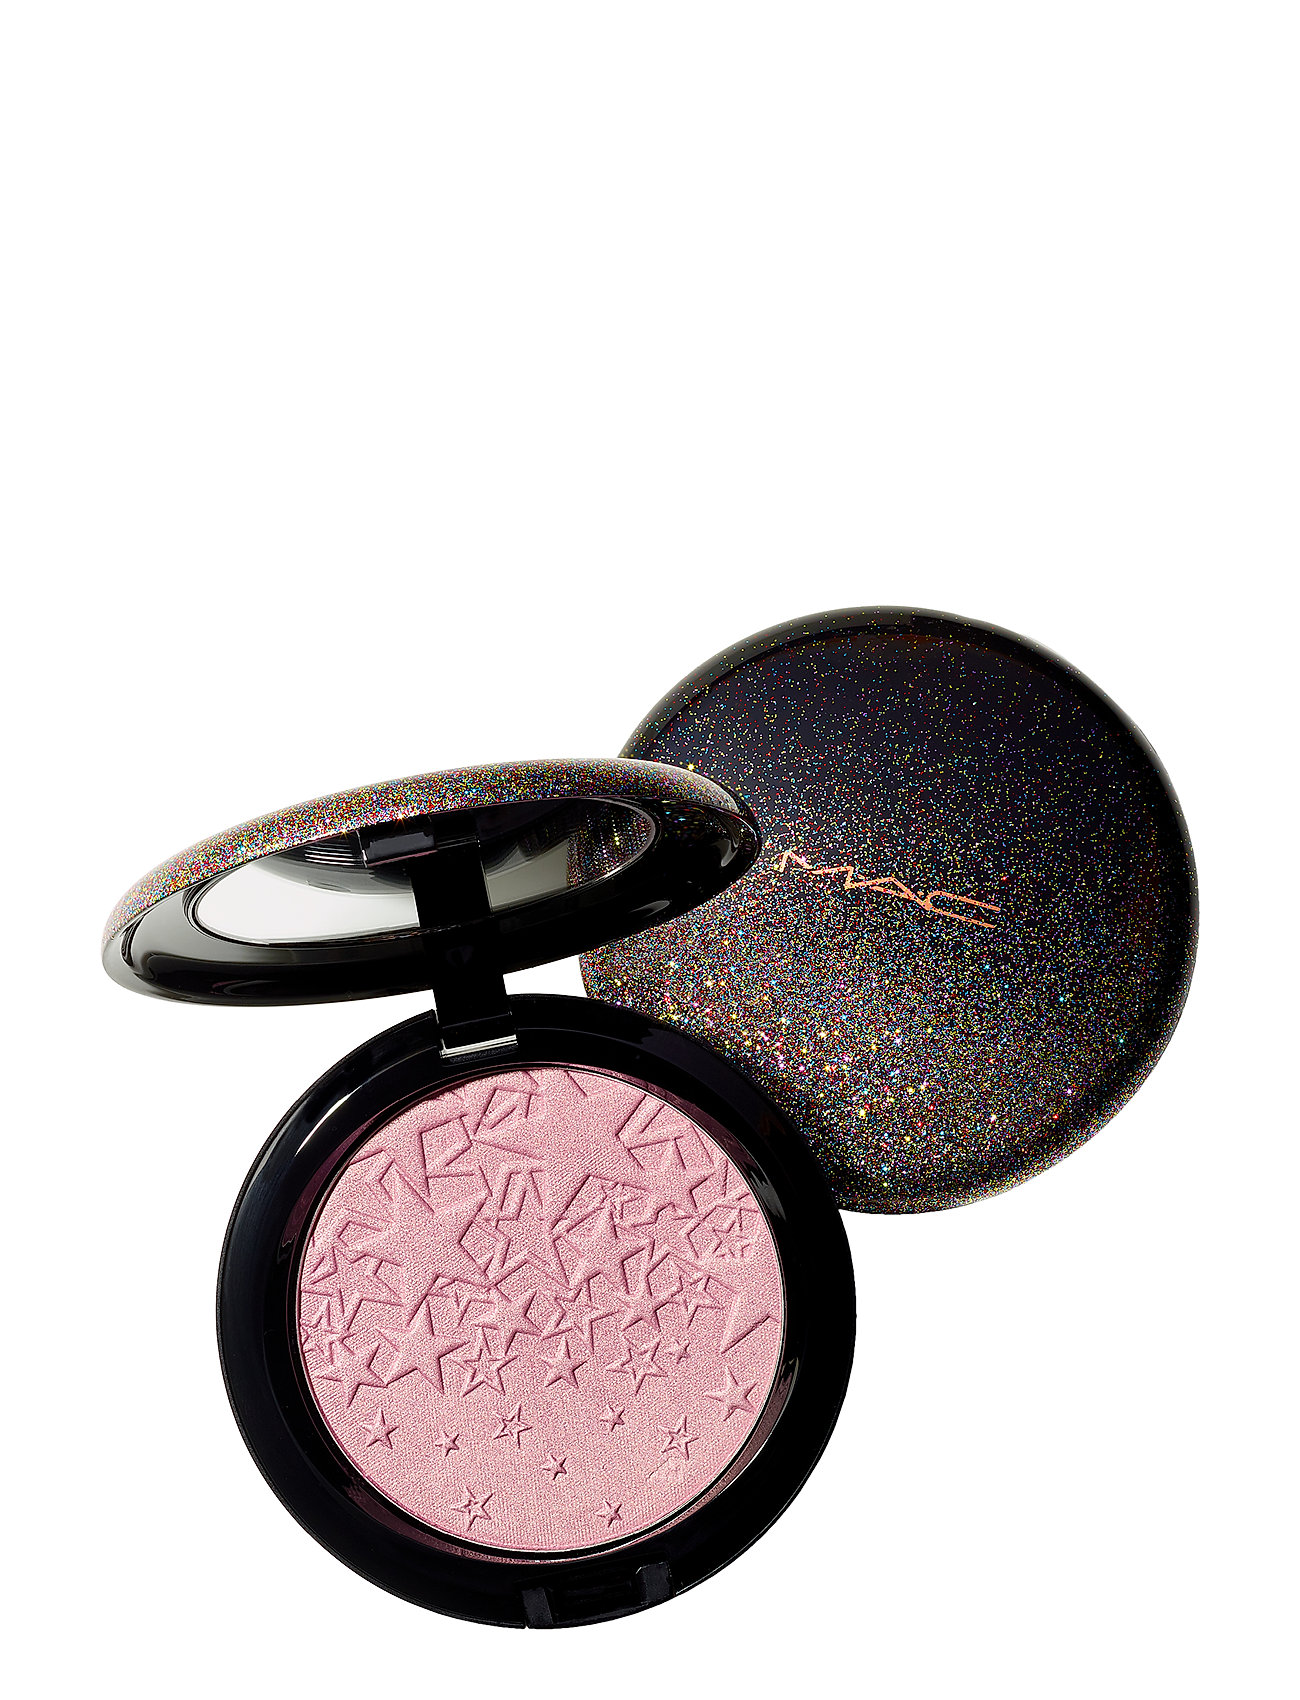 Image of Opalescent Powder Beauty WOMEN Makeup Face Blush M.A.C. (3406229869)